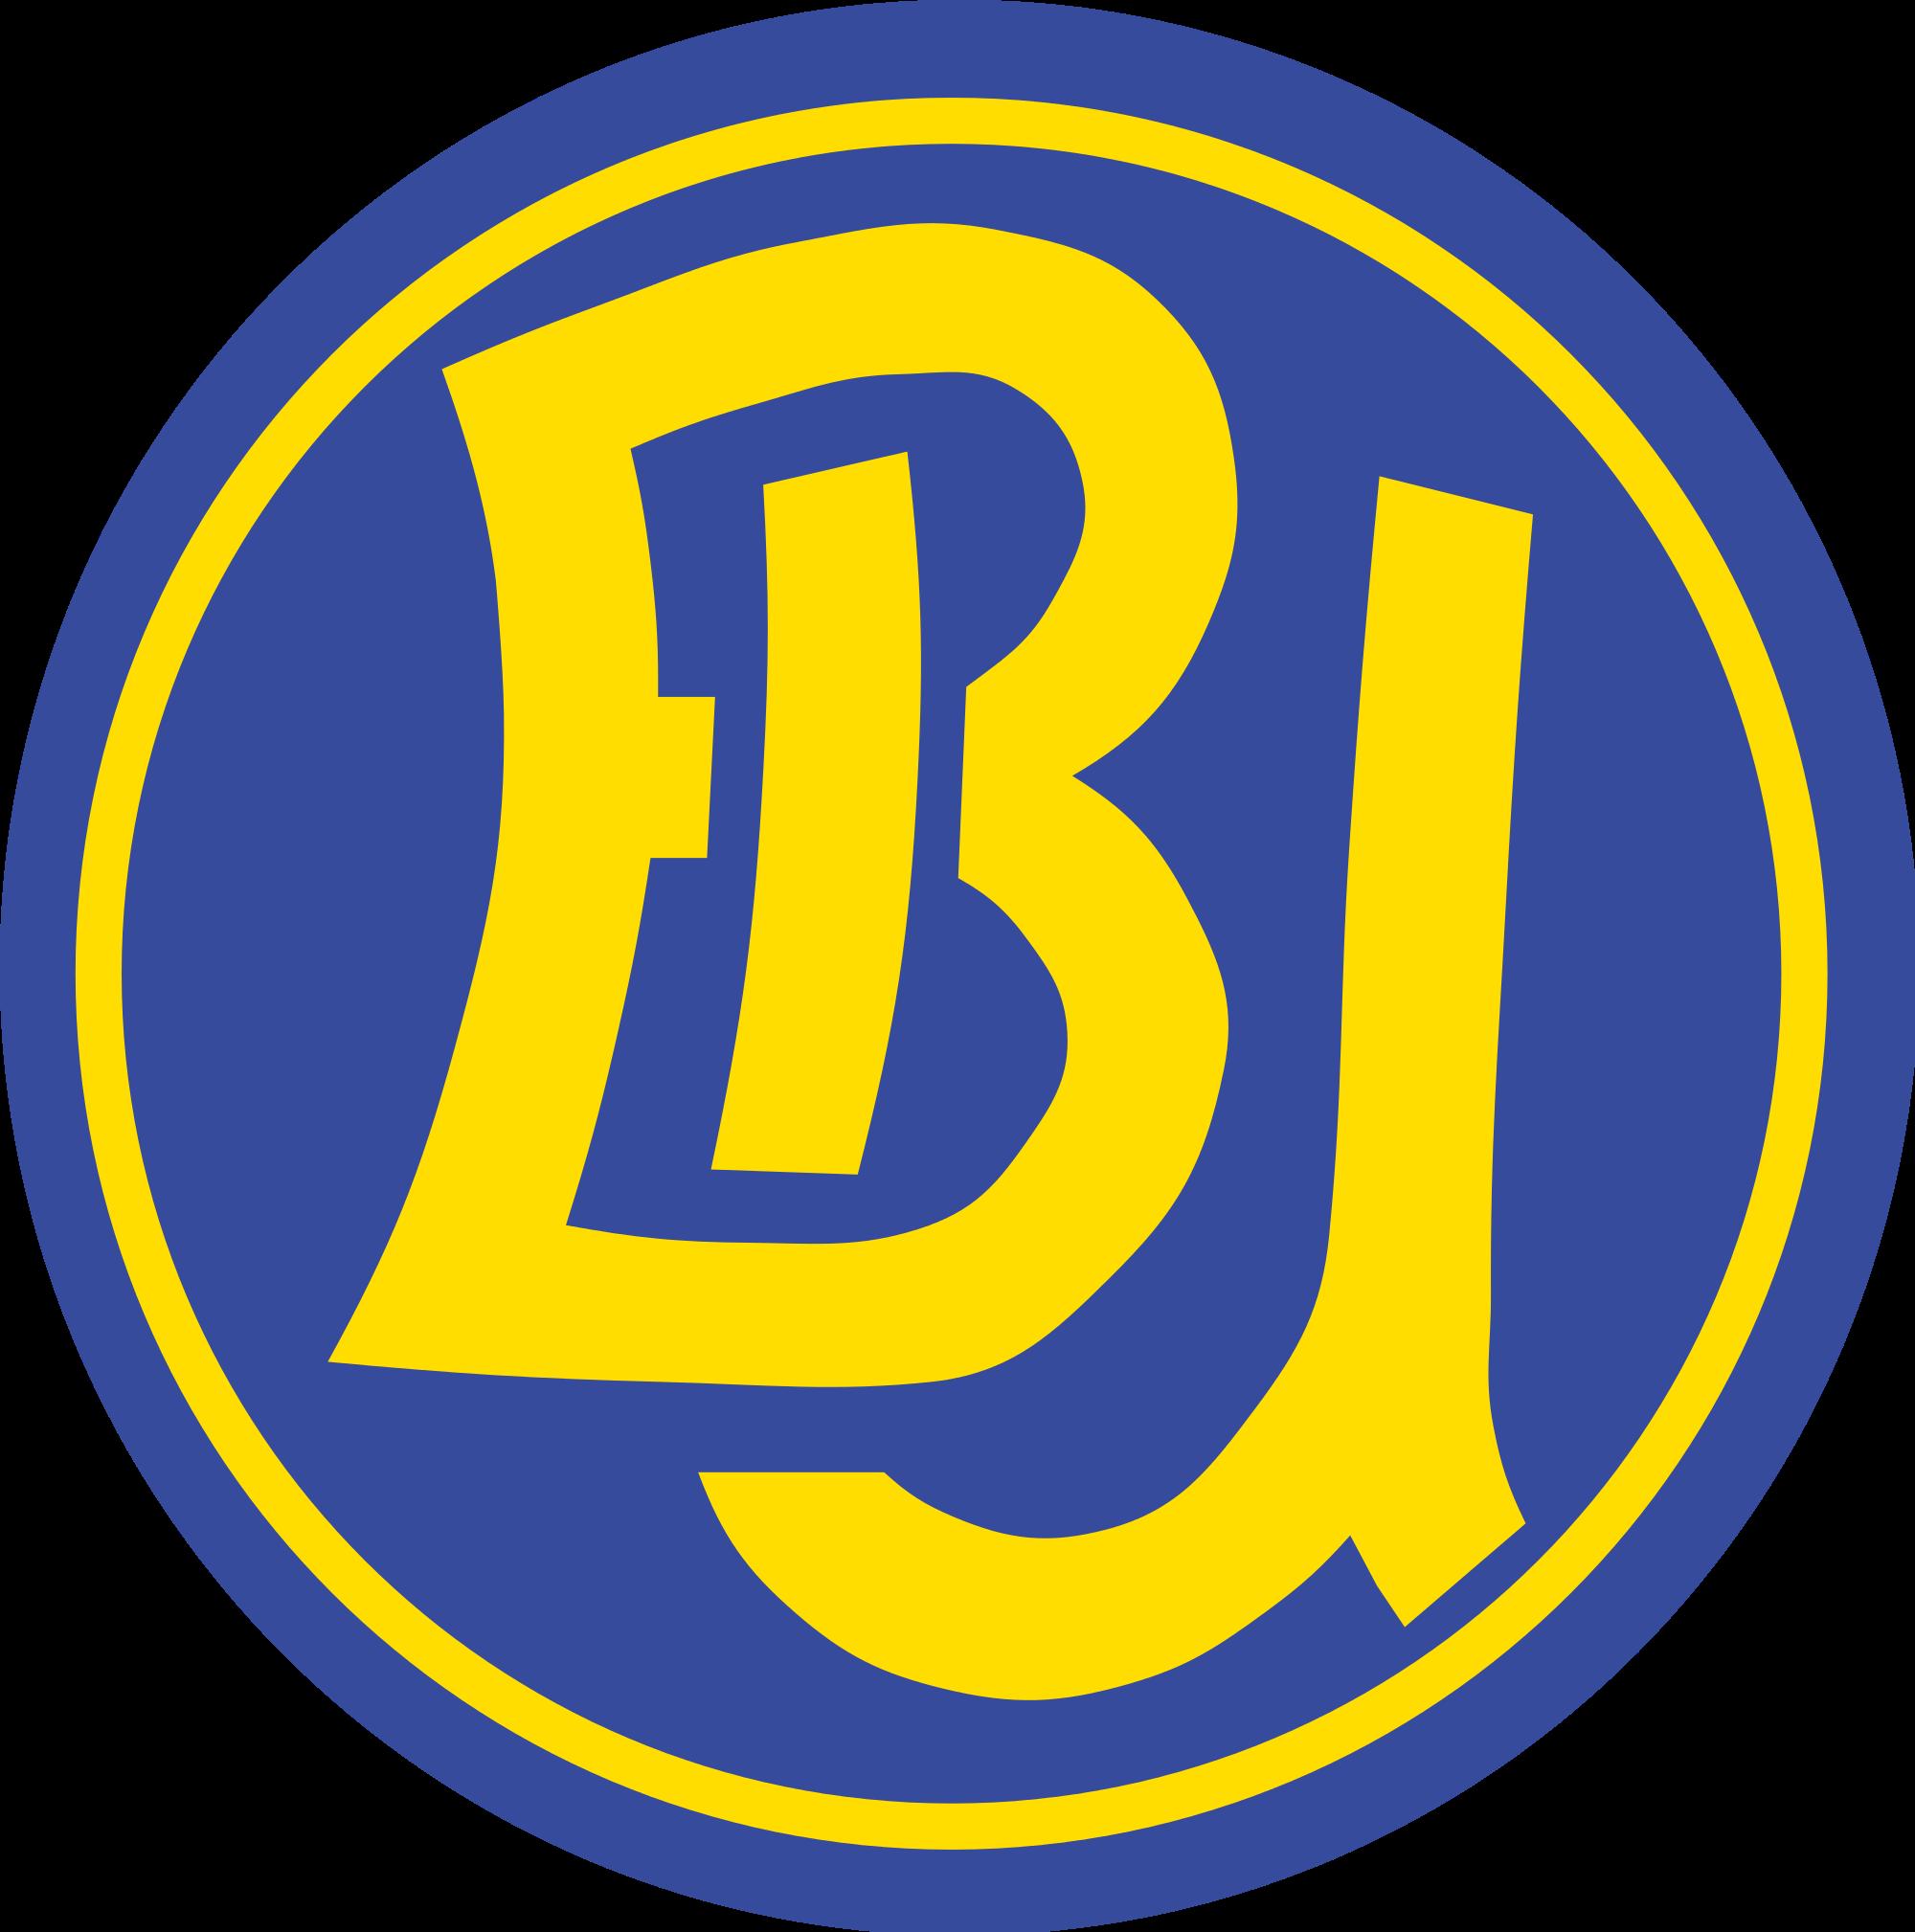 HSV Barmbek-Uhlenhorst team logo